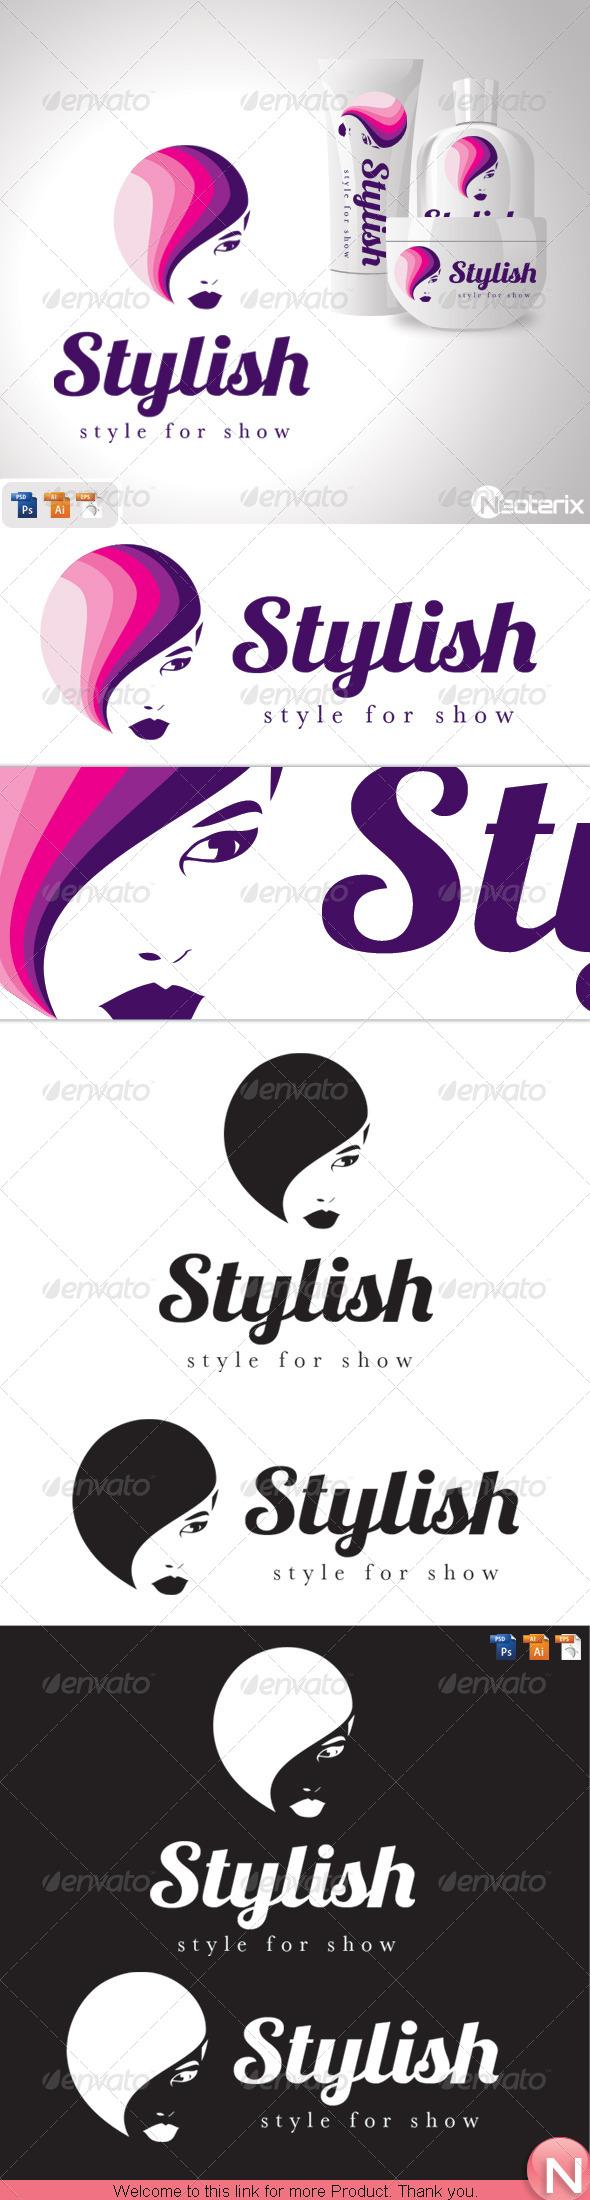 GraphicRiver Stylish 5711916